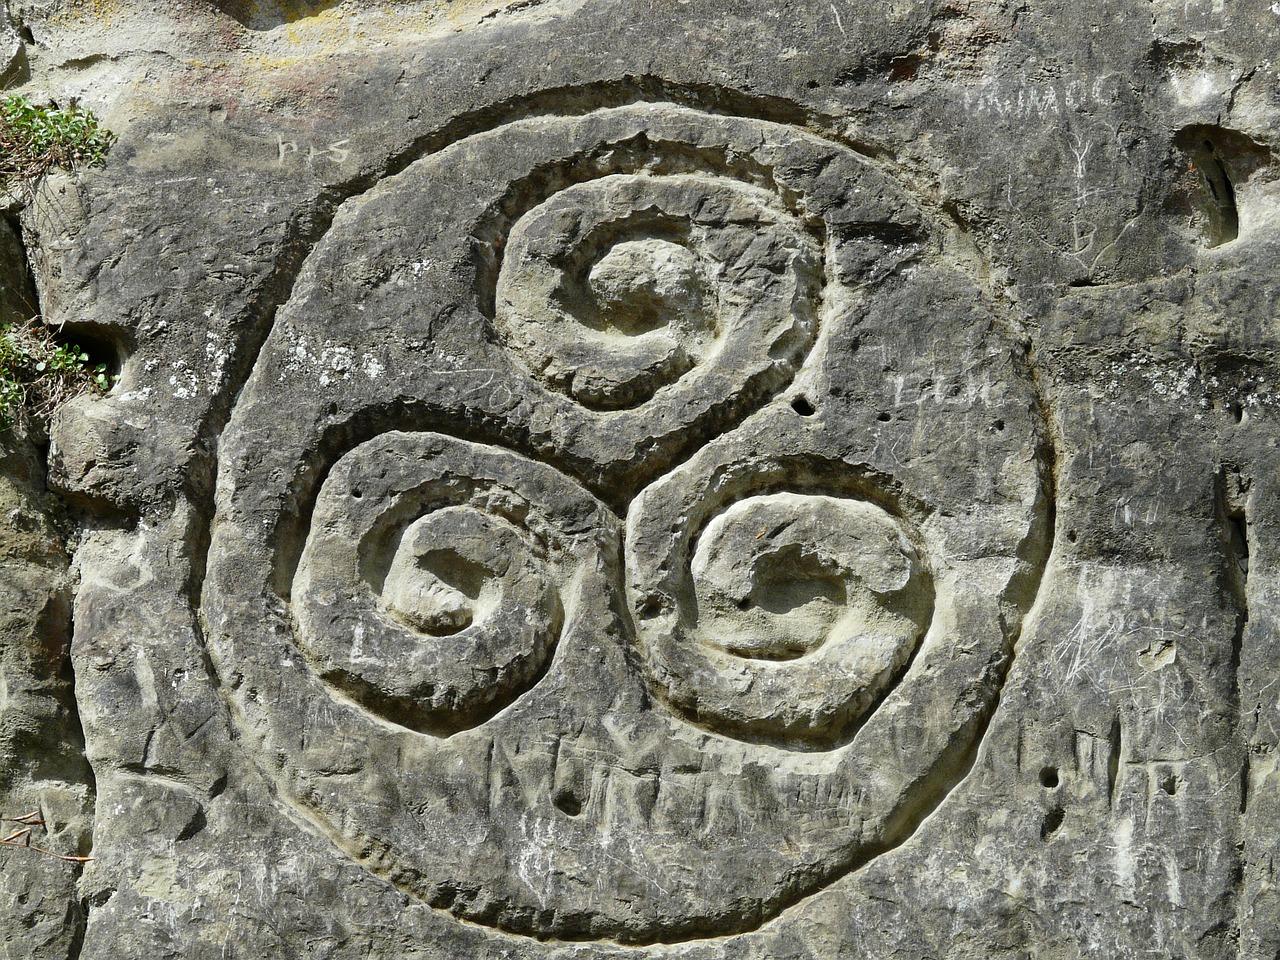 трискелион, узор, кельты